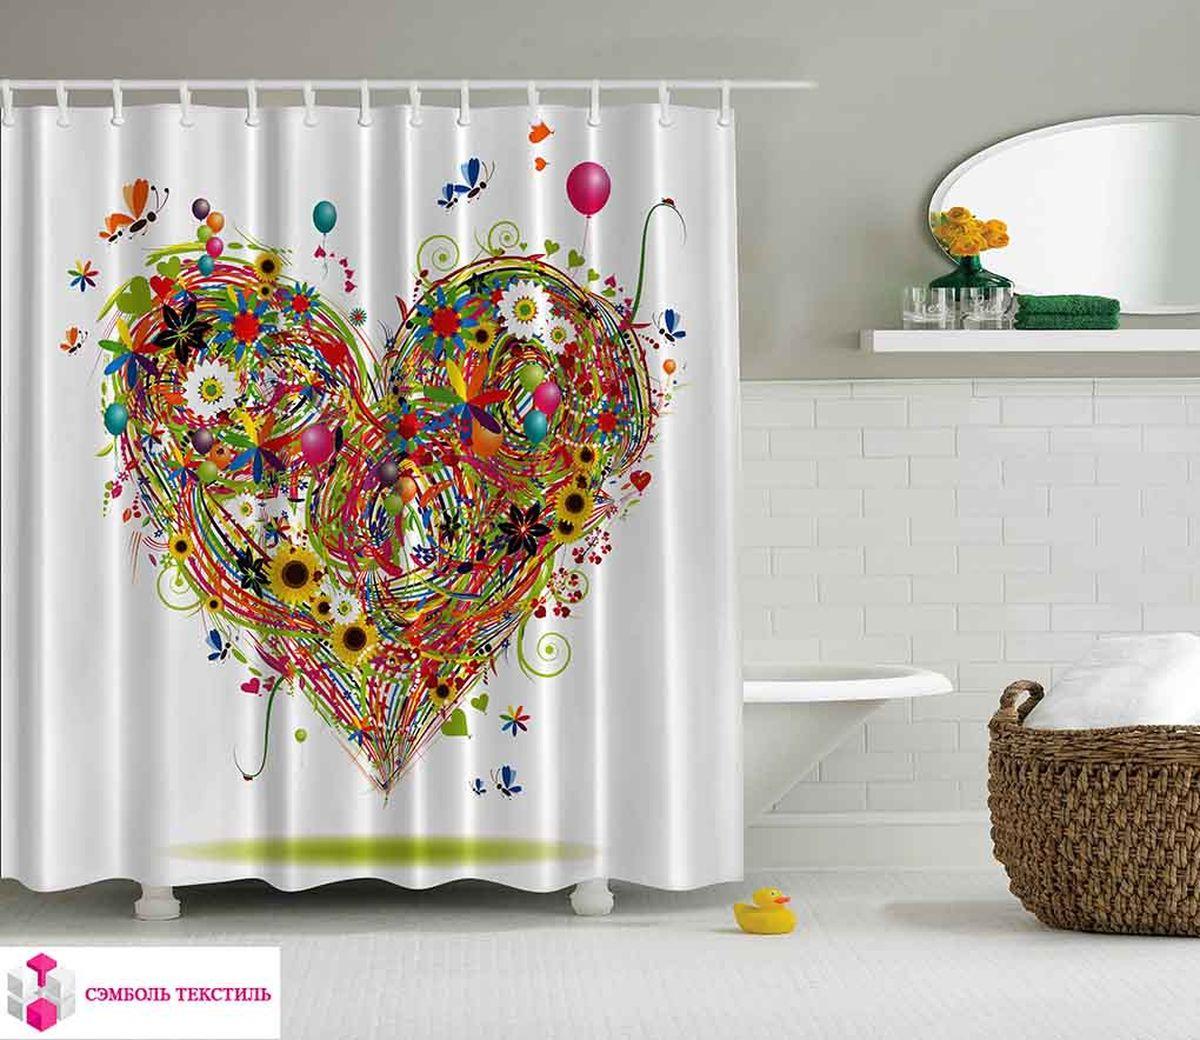 Штора для ванной комнаты Magic Lady Цветочное сердце, 180 х 200 см. шв_2693 фотоштора для ванной утка принимает душ magic lady 180 х 200 см